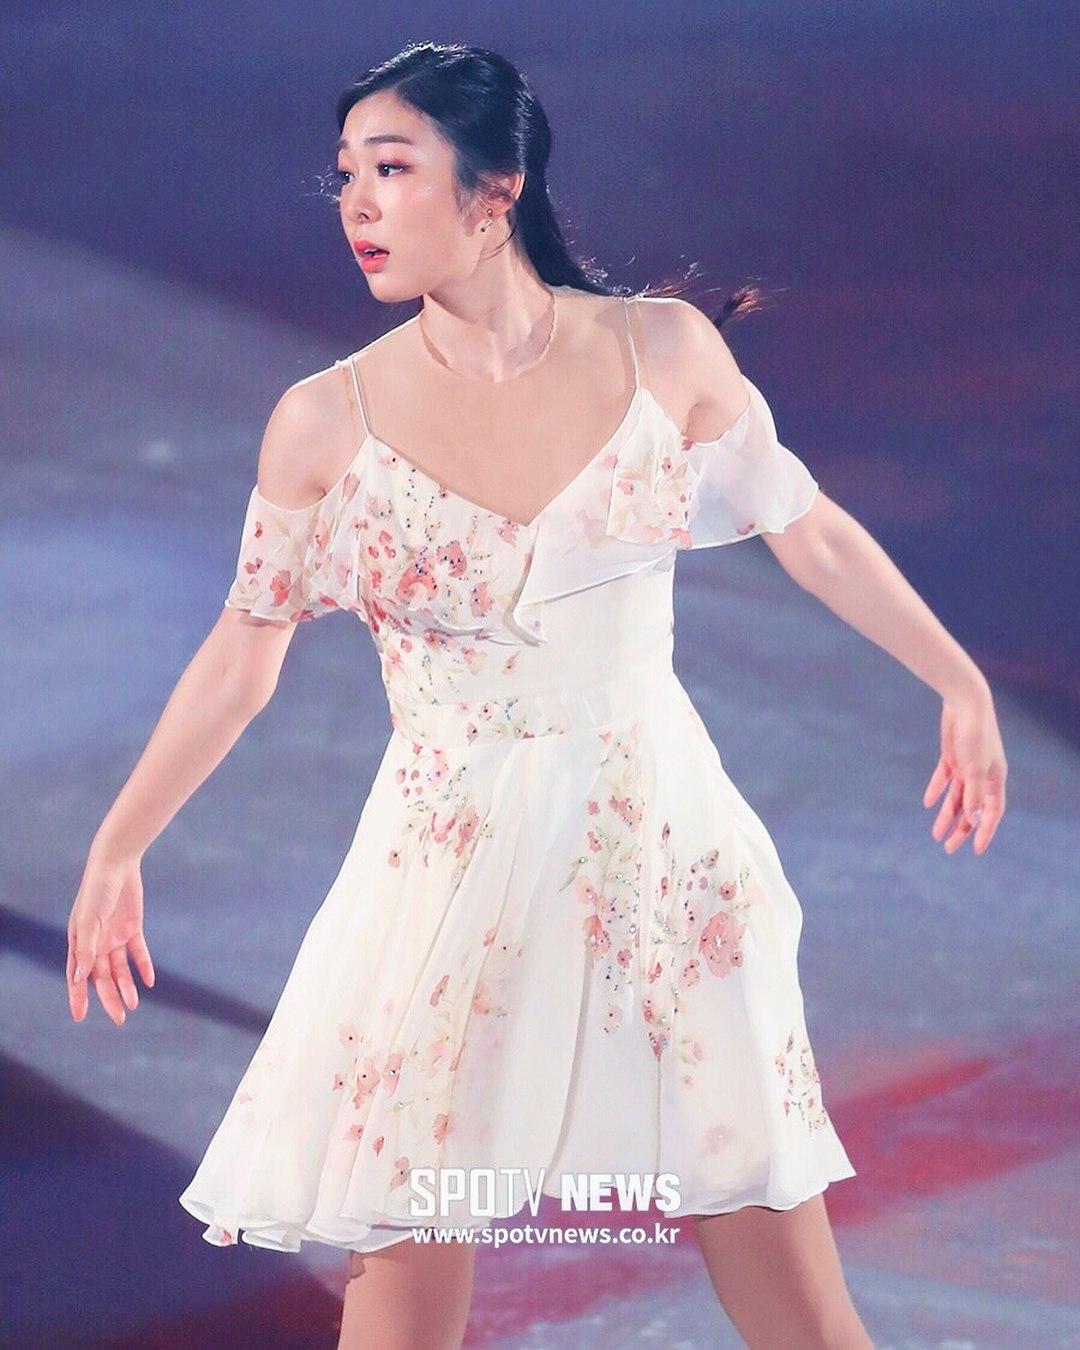 Юна Ким - Страница 4 KSUb4Na11uU